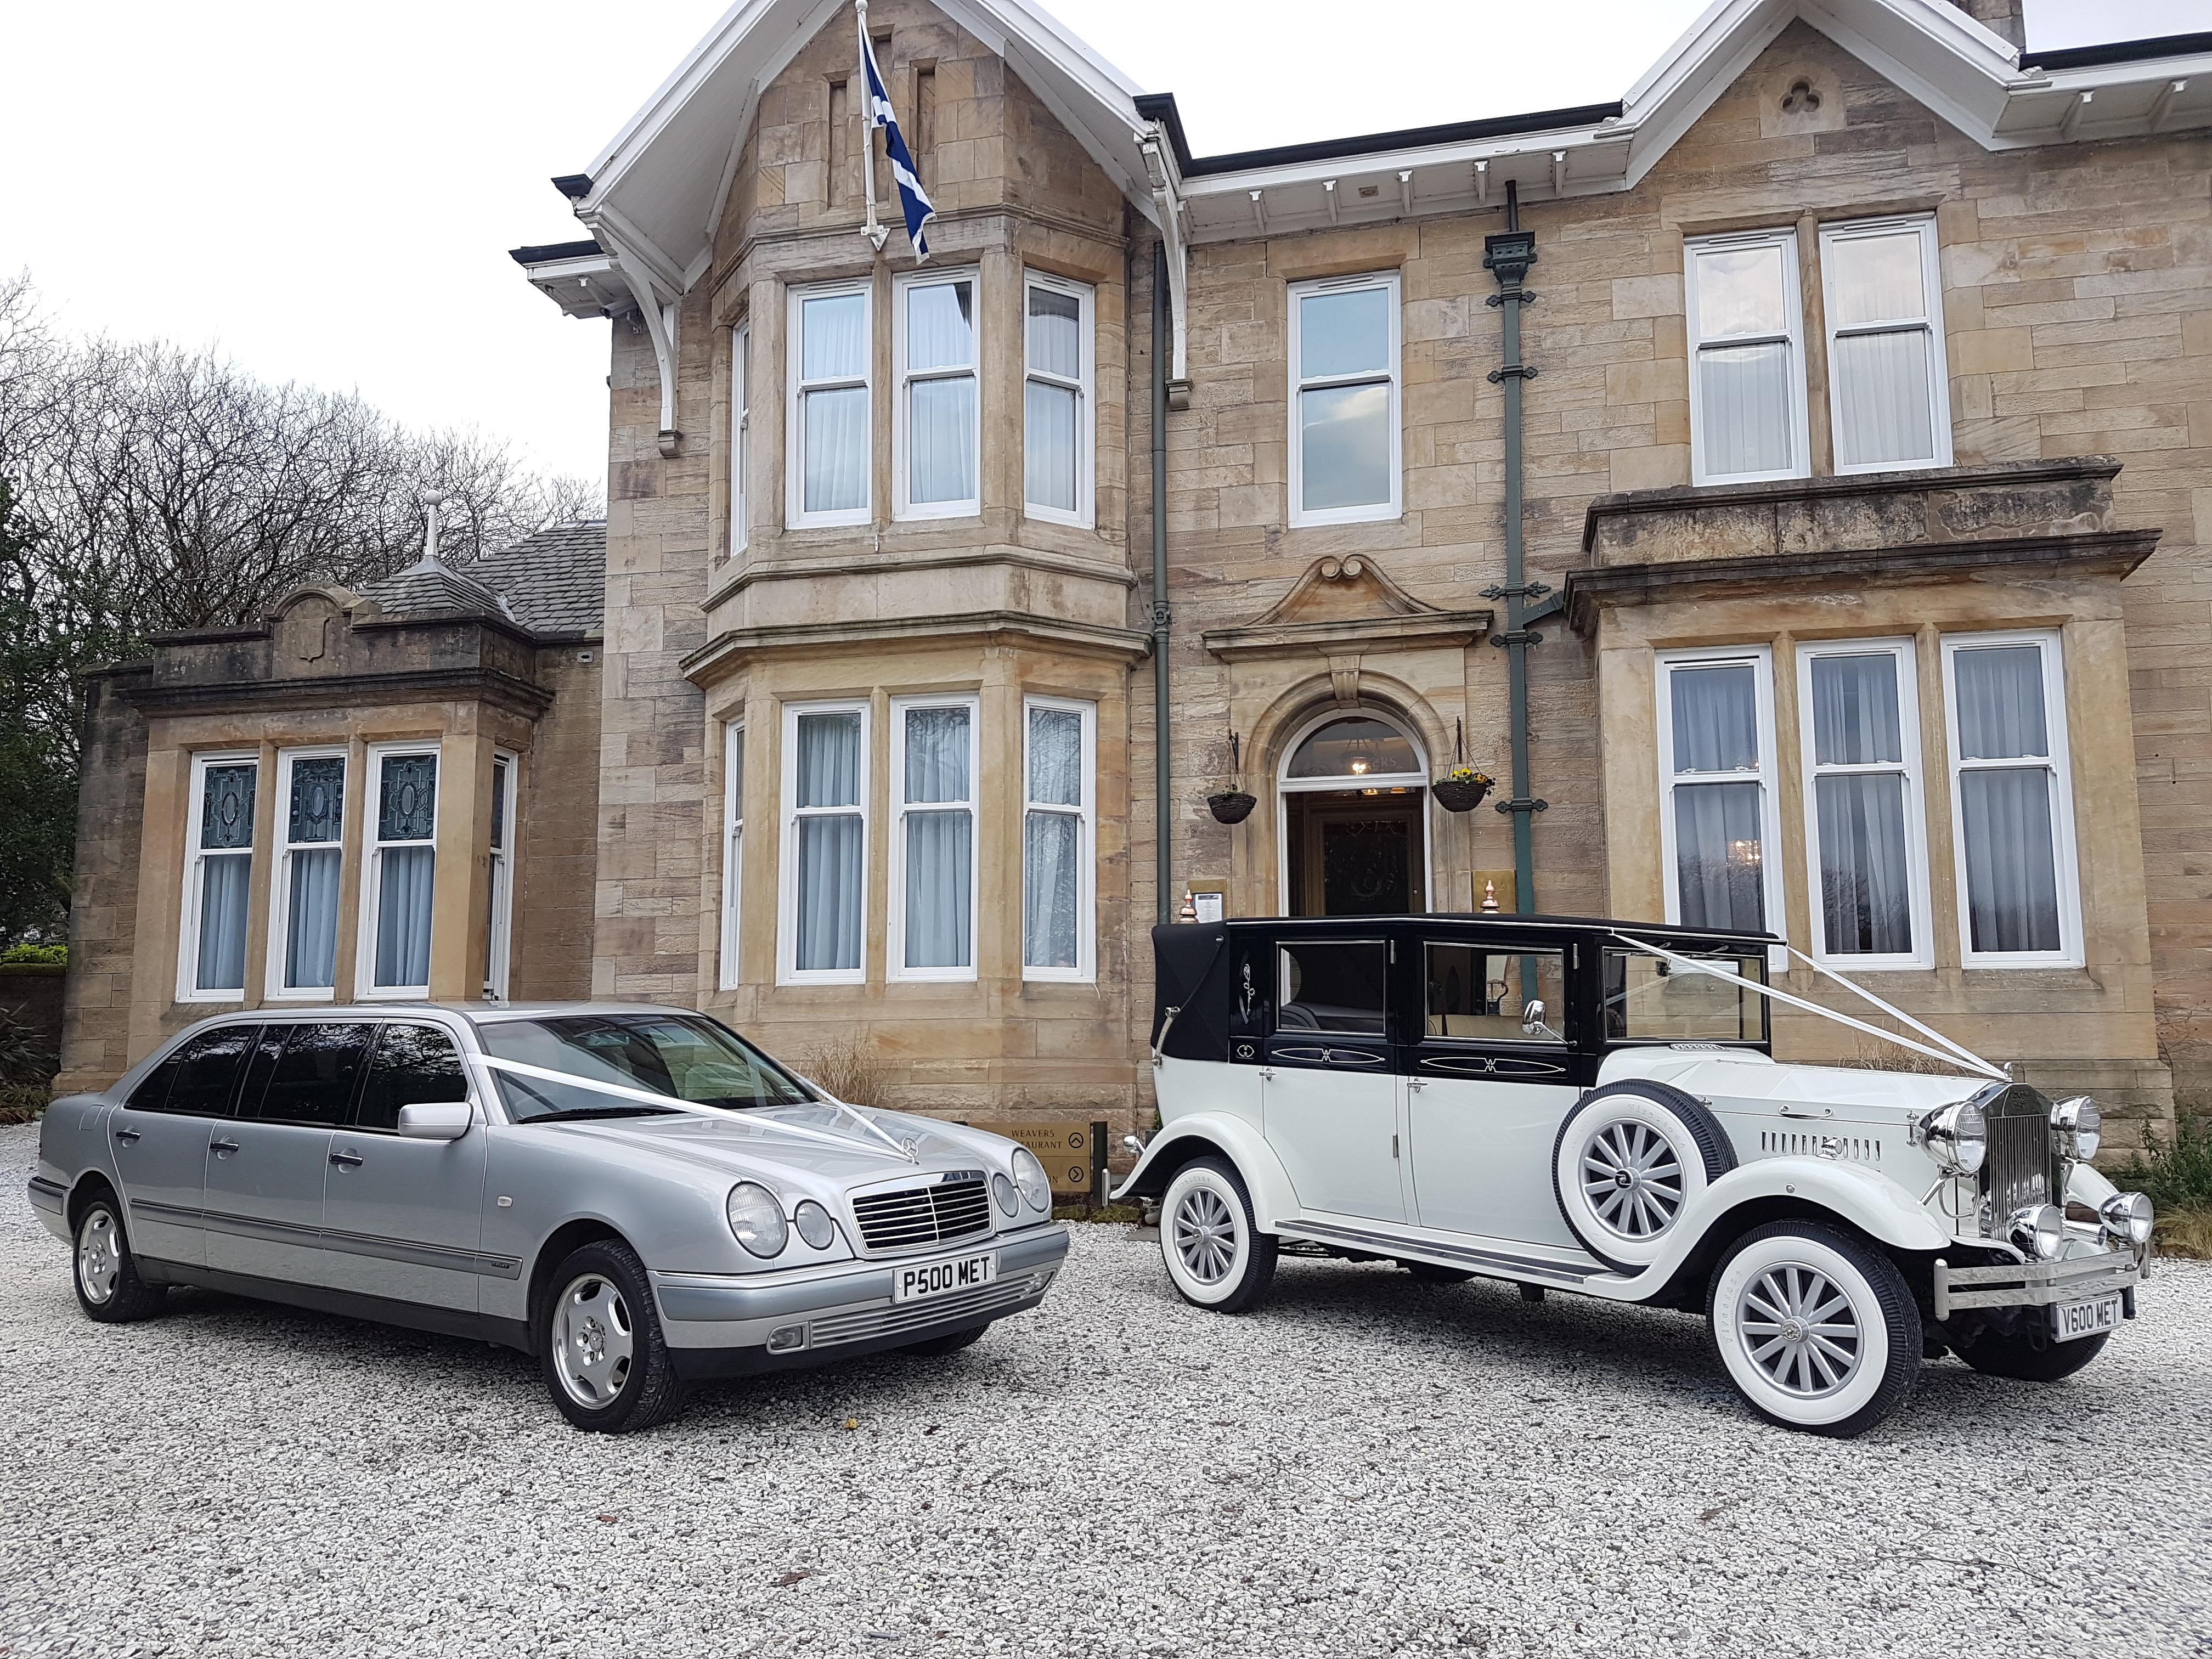 Limousine & White Viscount